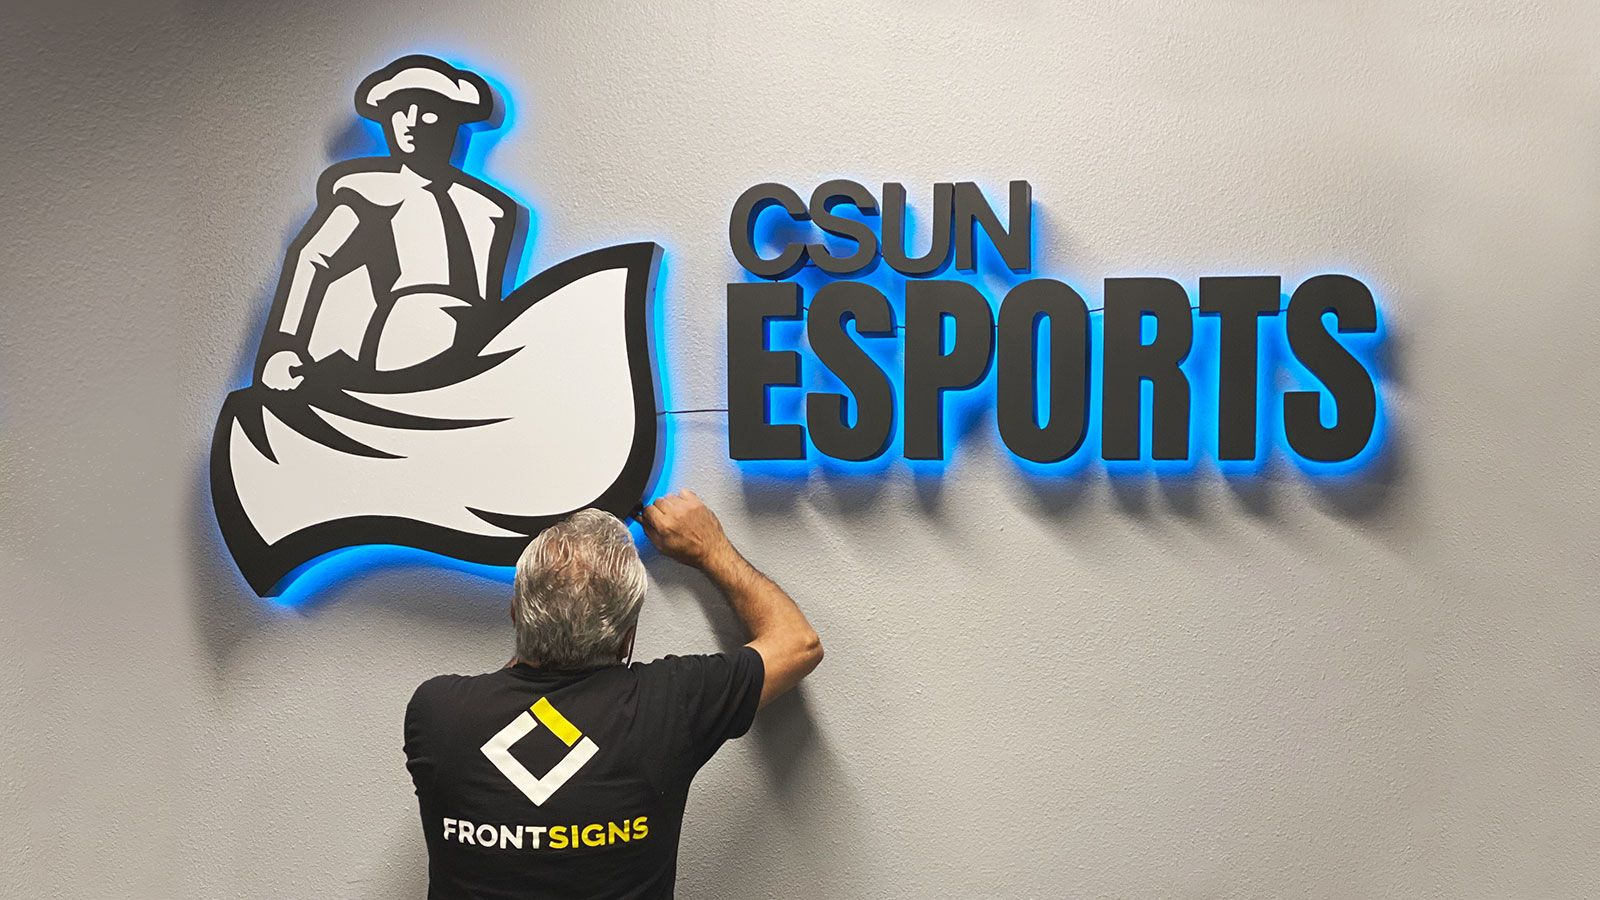 csun esports backlit sign installation